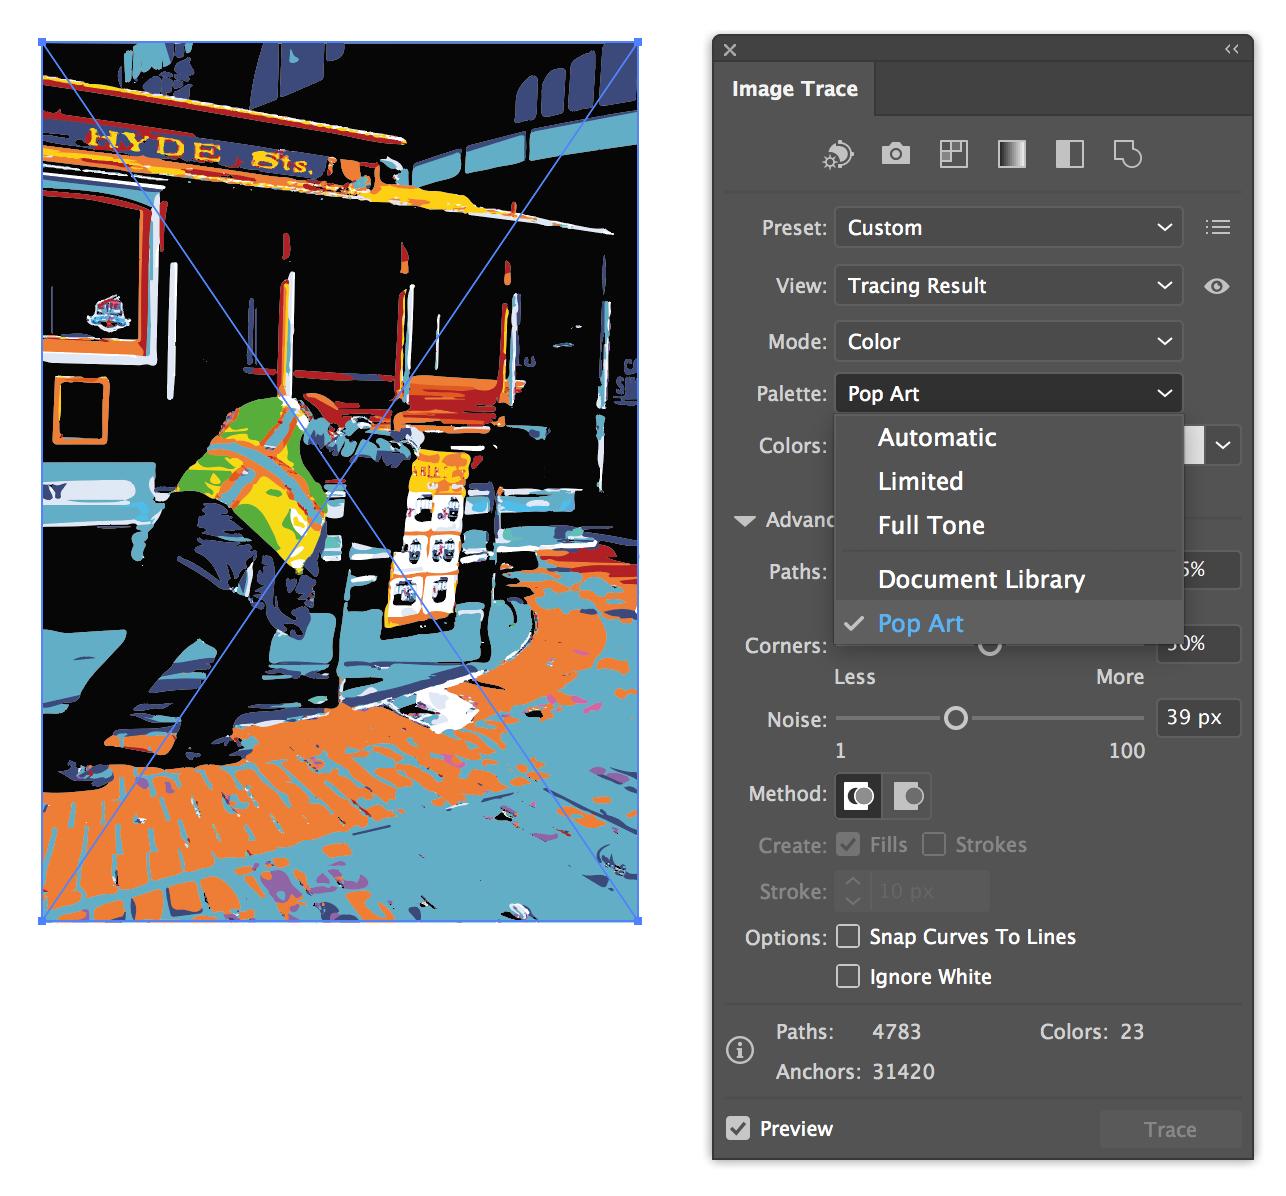 Image tracing presets